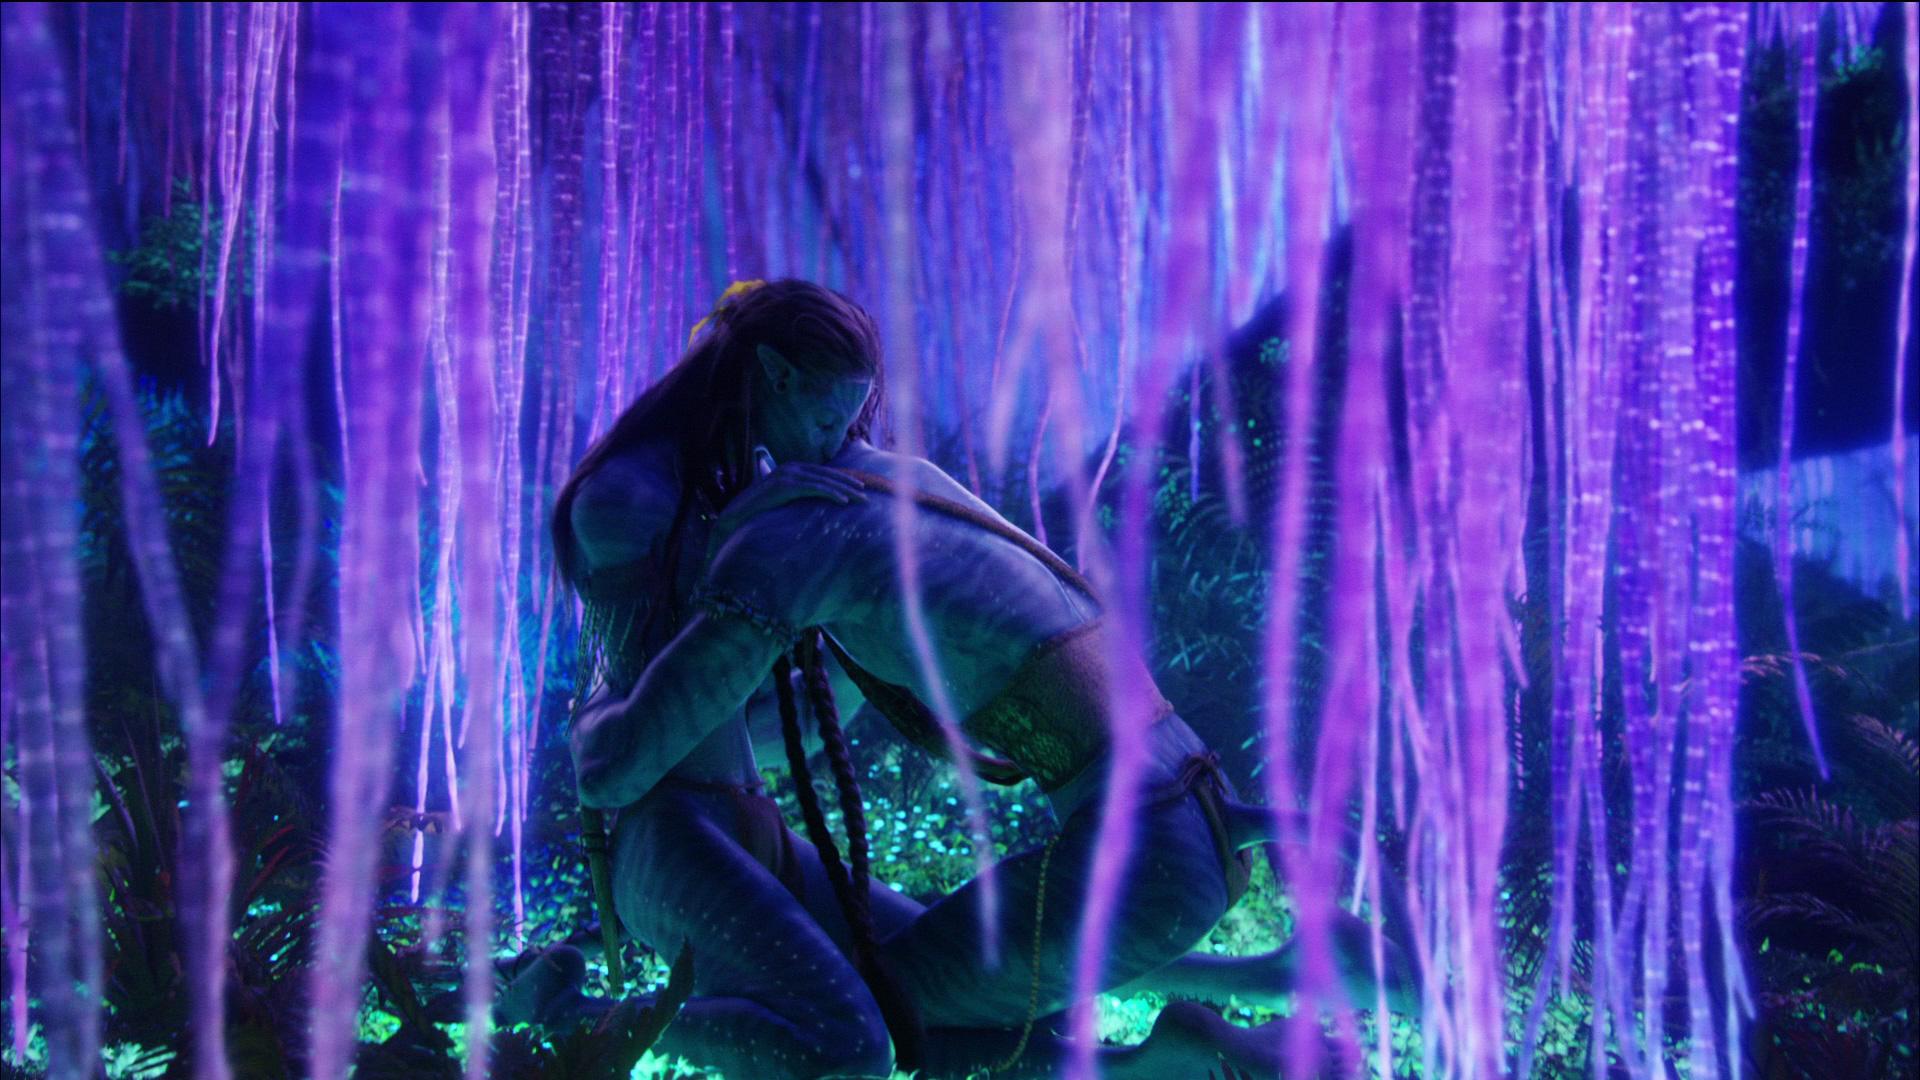 Джек Салли и Нейтири из фильма Аватар  № 1385725 без смс